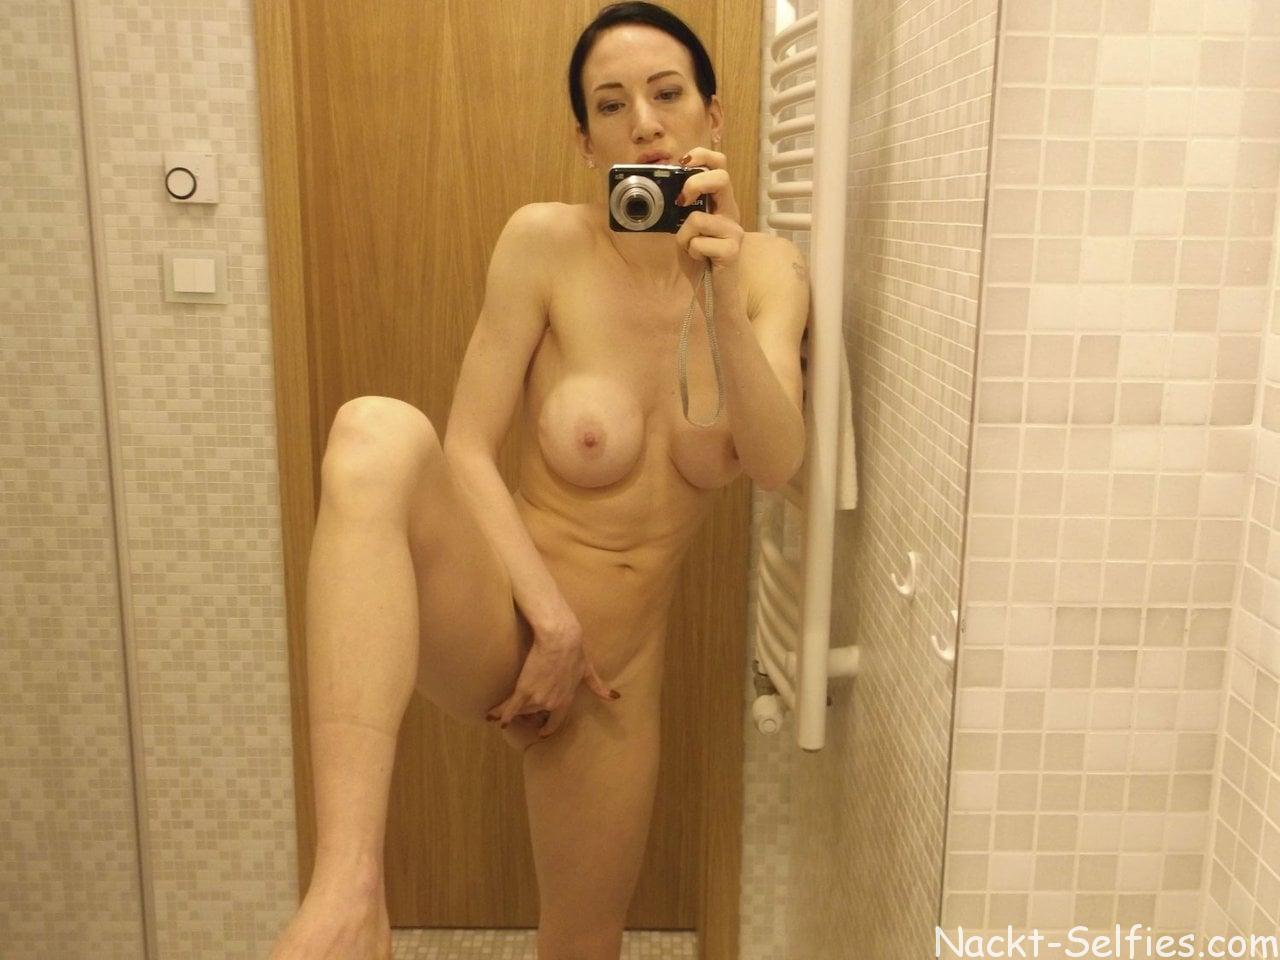 Amateur Nackt Selfie Alissa 04